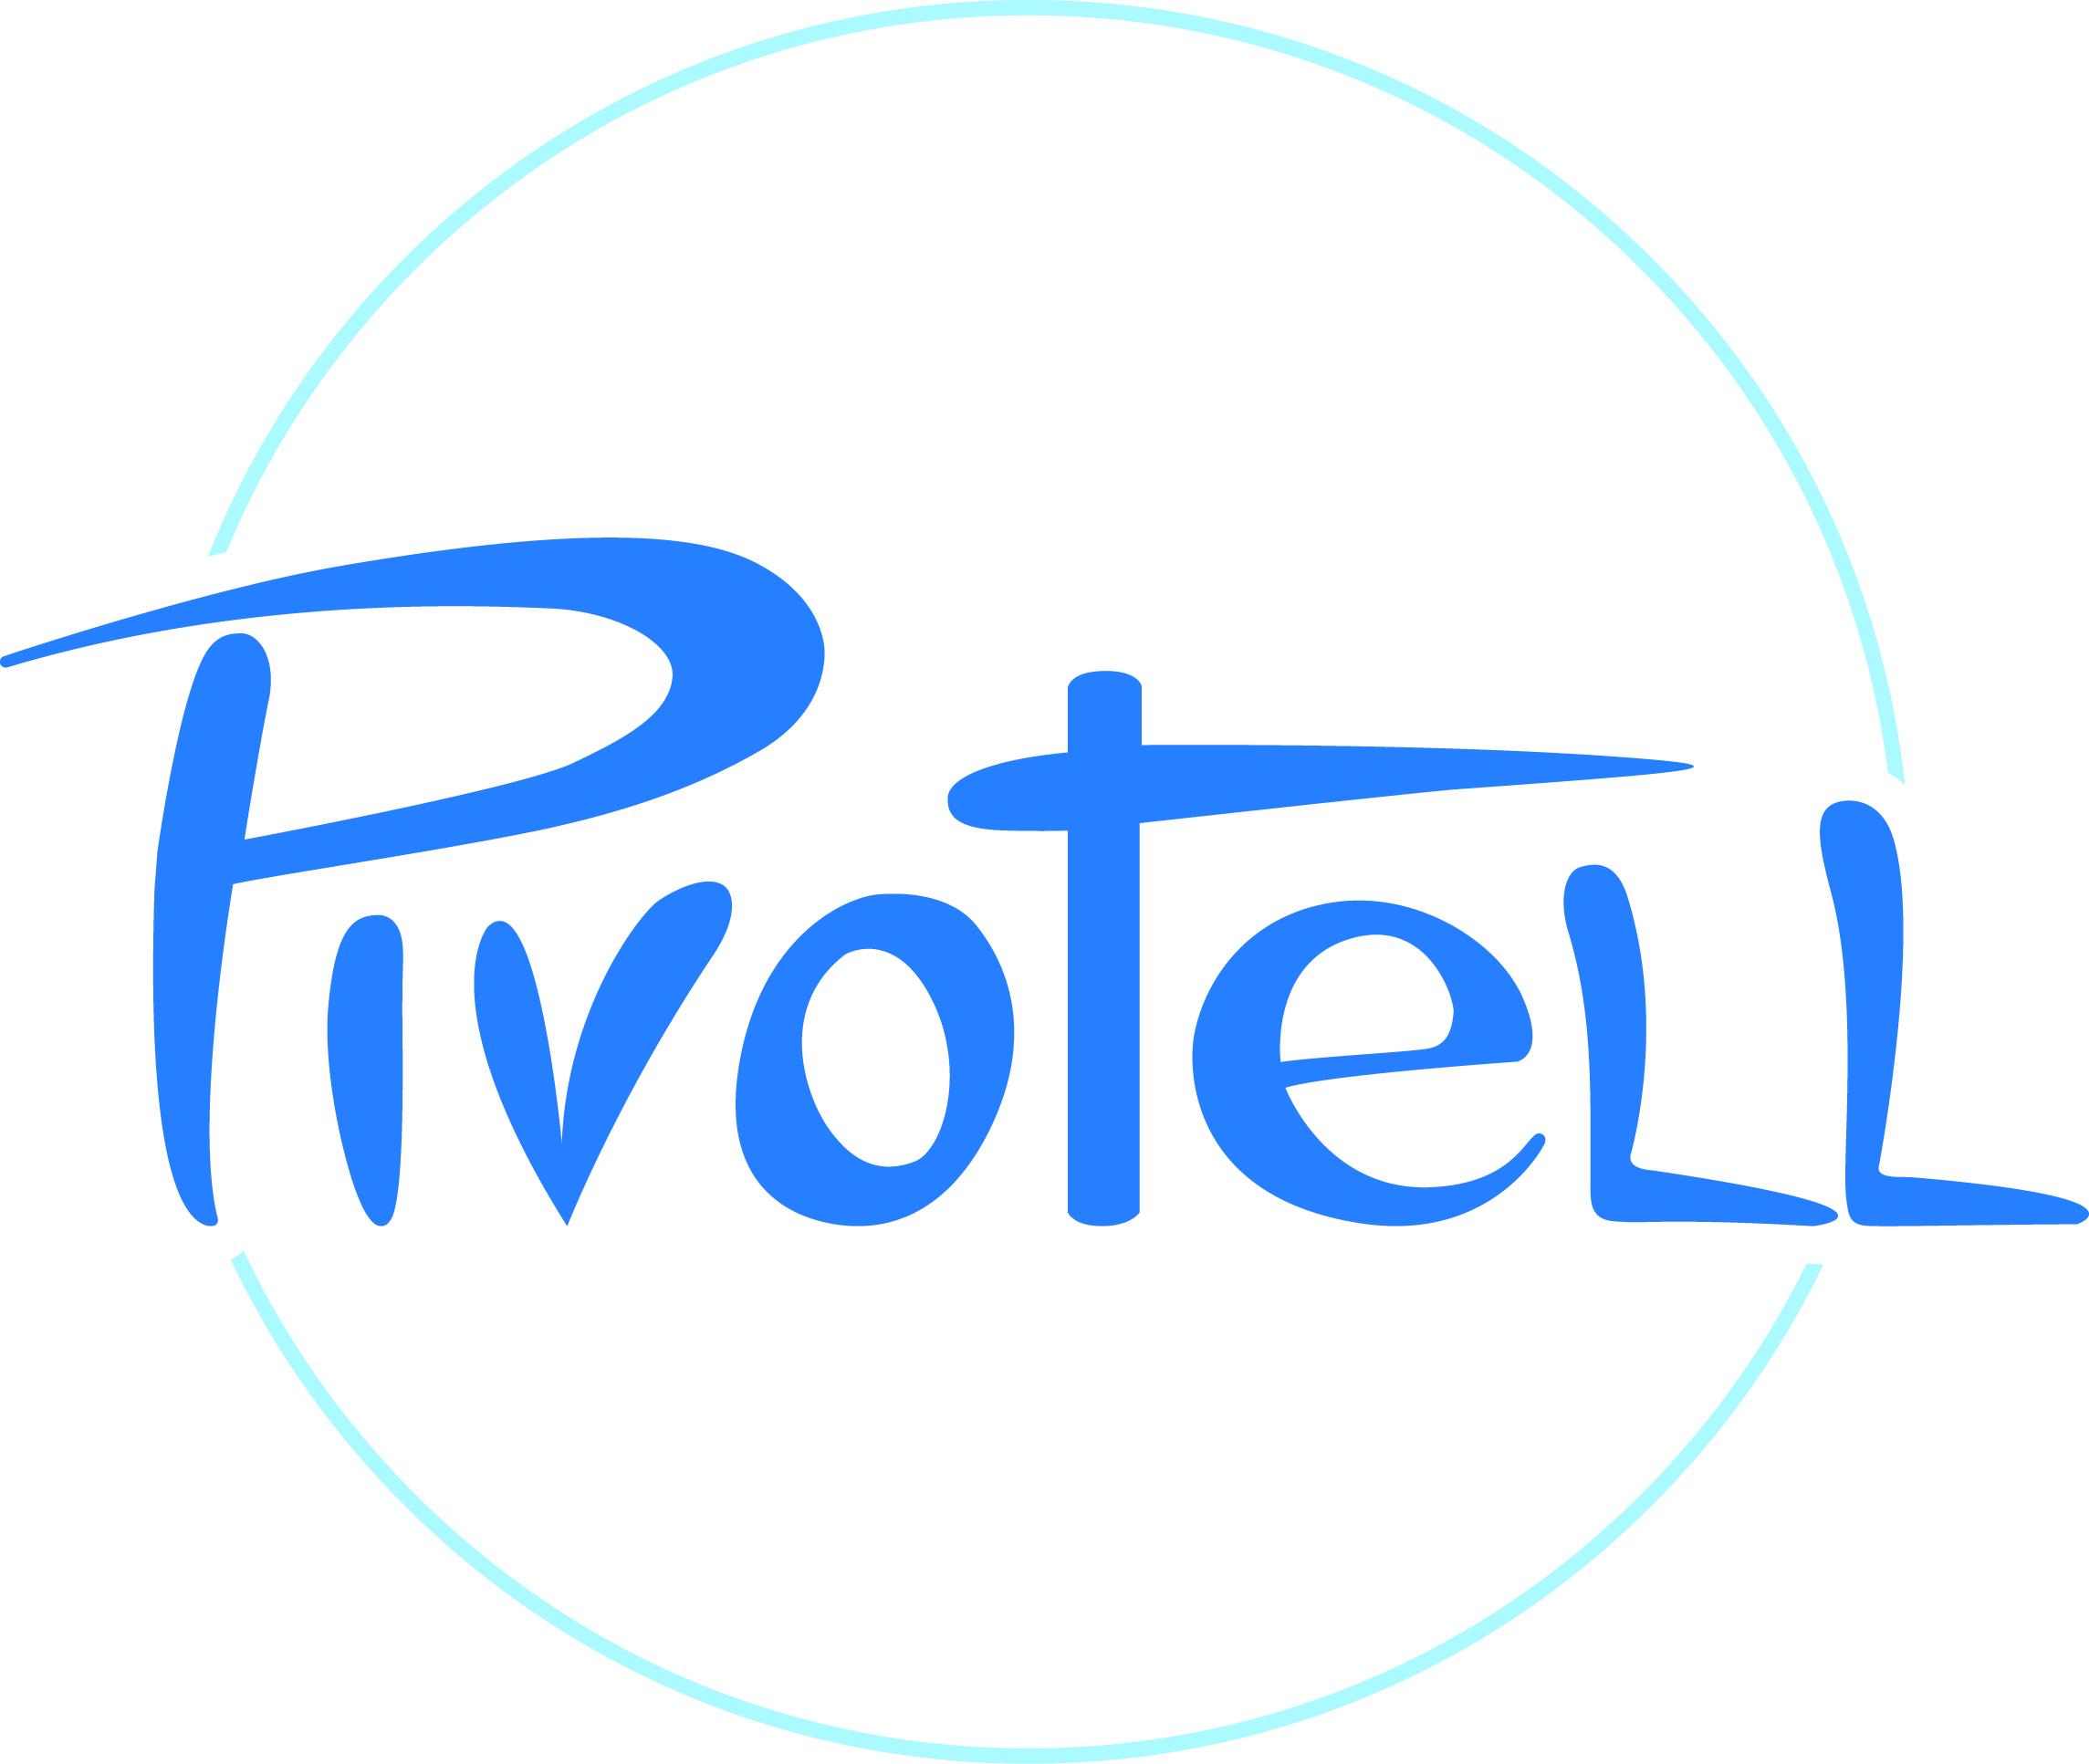 Pivotell Ltd